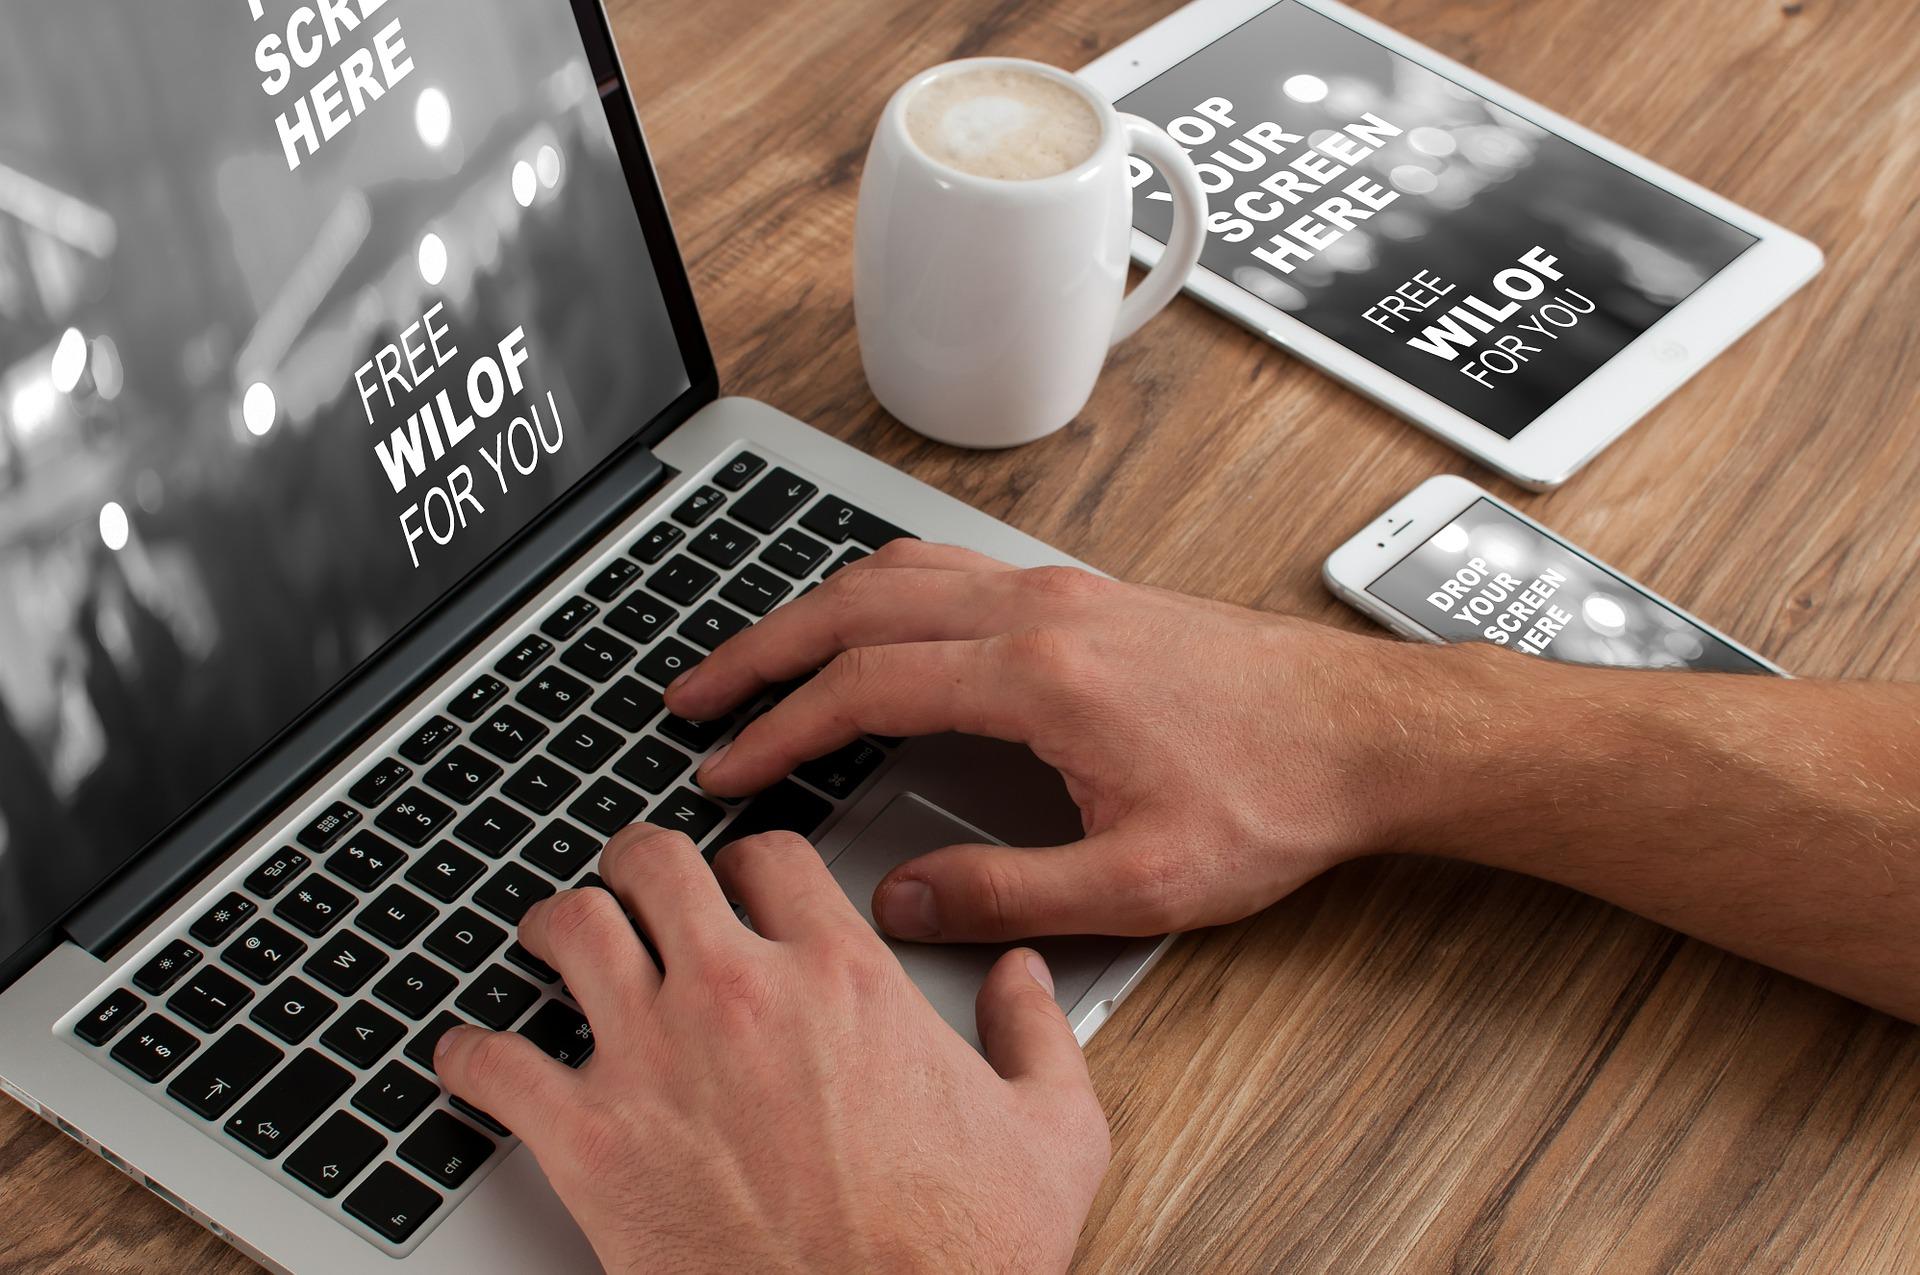 Proteger os dados do seu laptop + smartphone + tablet é primordial para se manter longe de ciber ataques